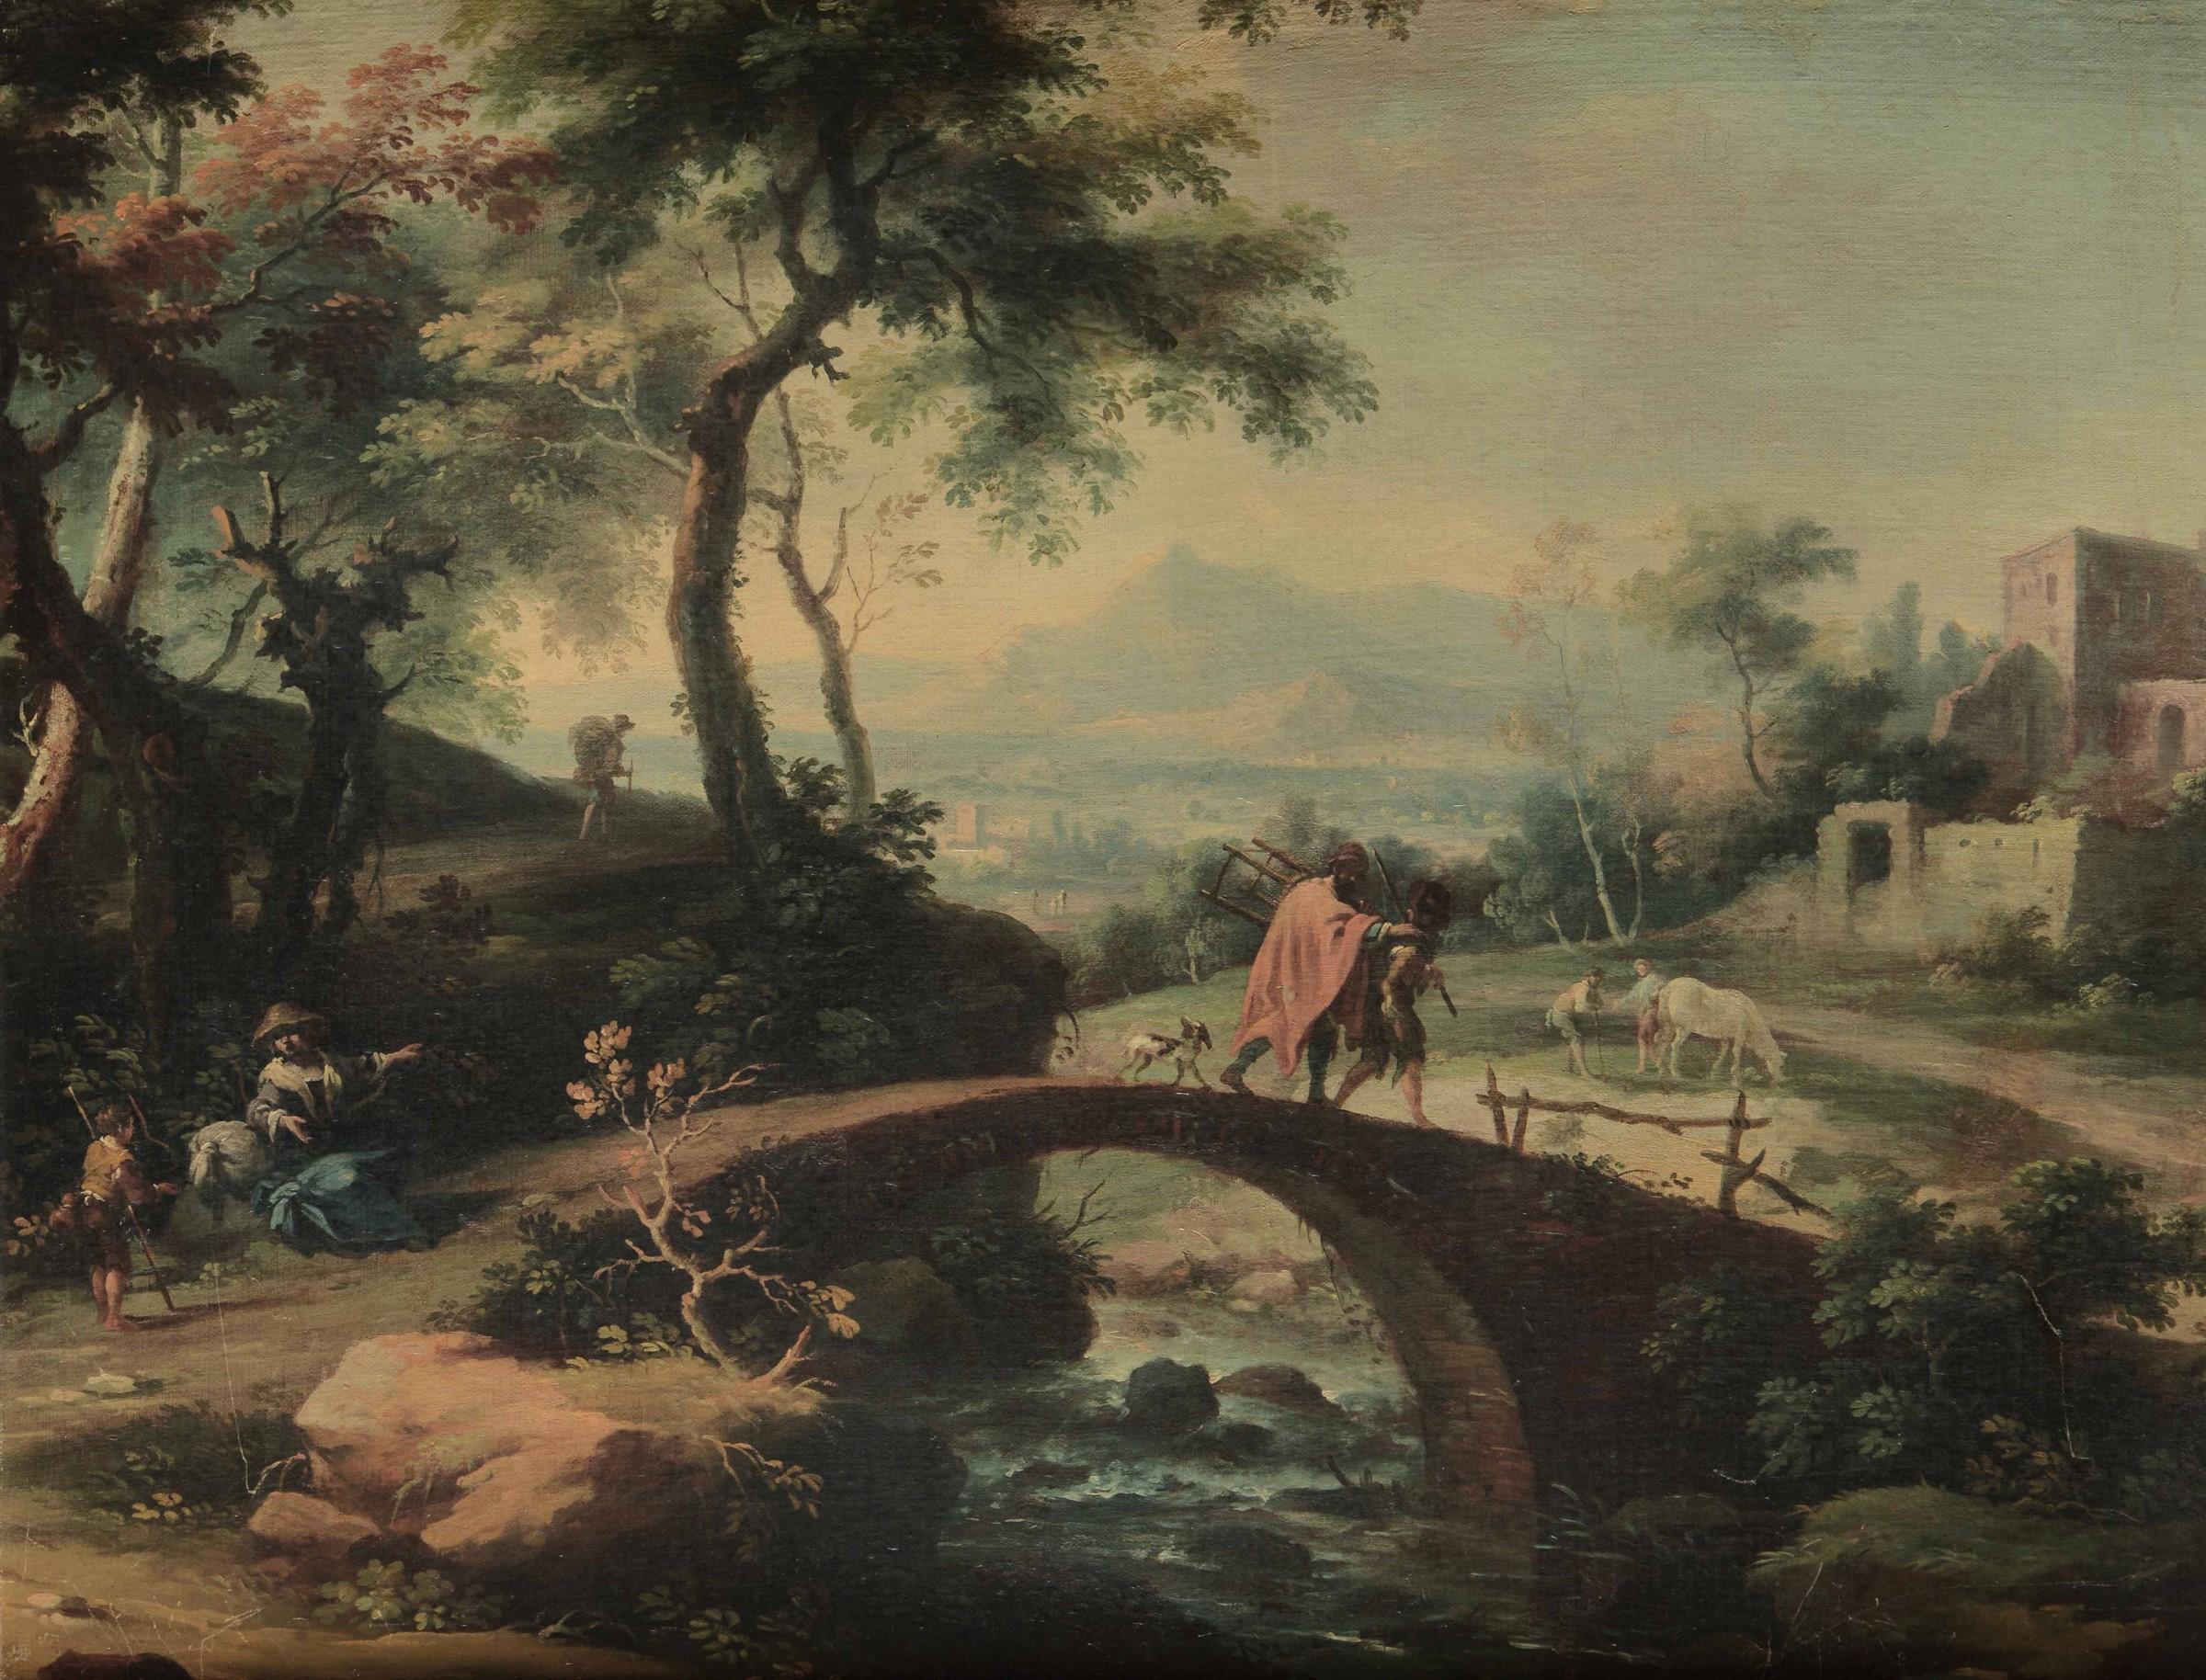 Vittorio Amedeo Cignaroli (Torino 1730-1800), Paesaggio con viandanti - olio su tela, [...]